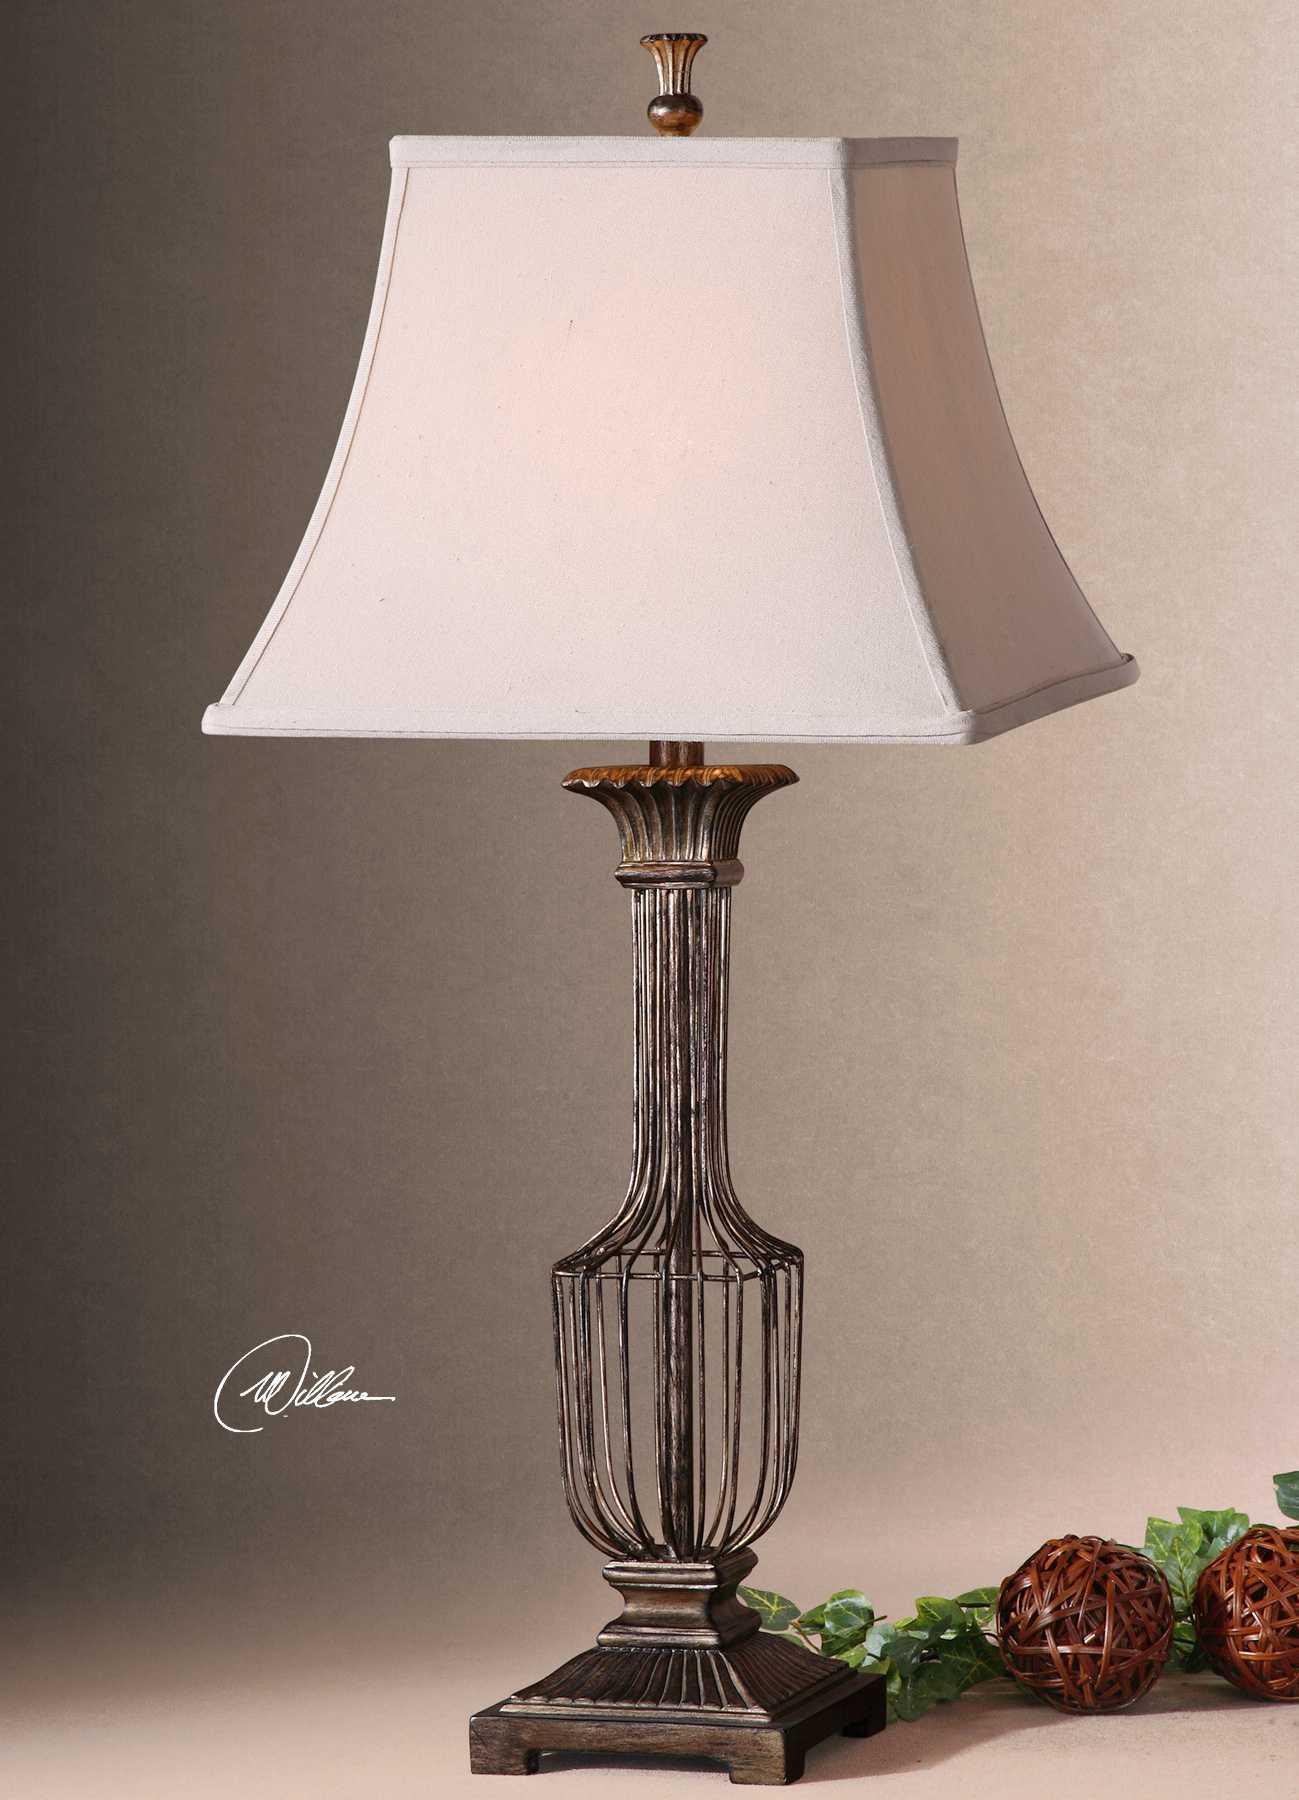 uttermost anacapri antique gold table lamp ut26262. Black Bedroom Furniture Sets. Home Design Ideas